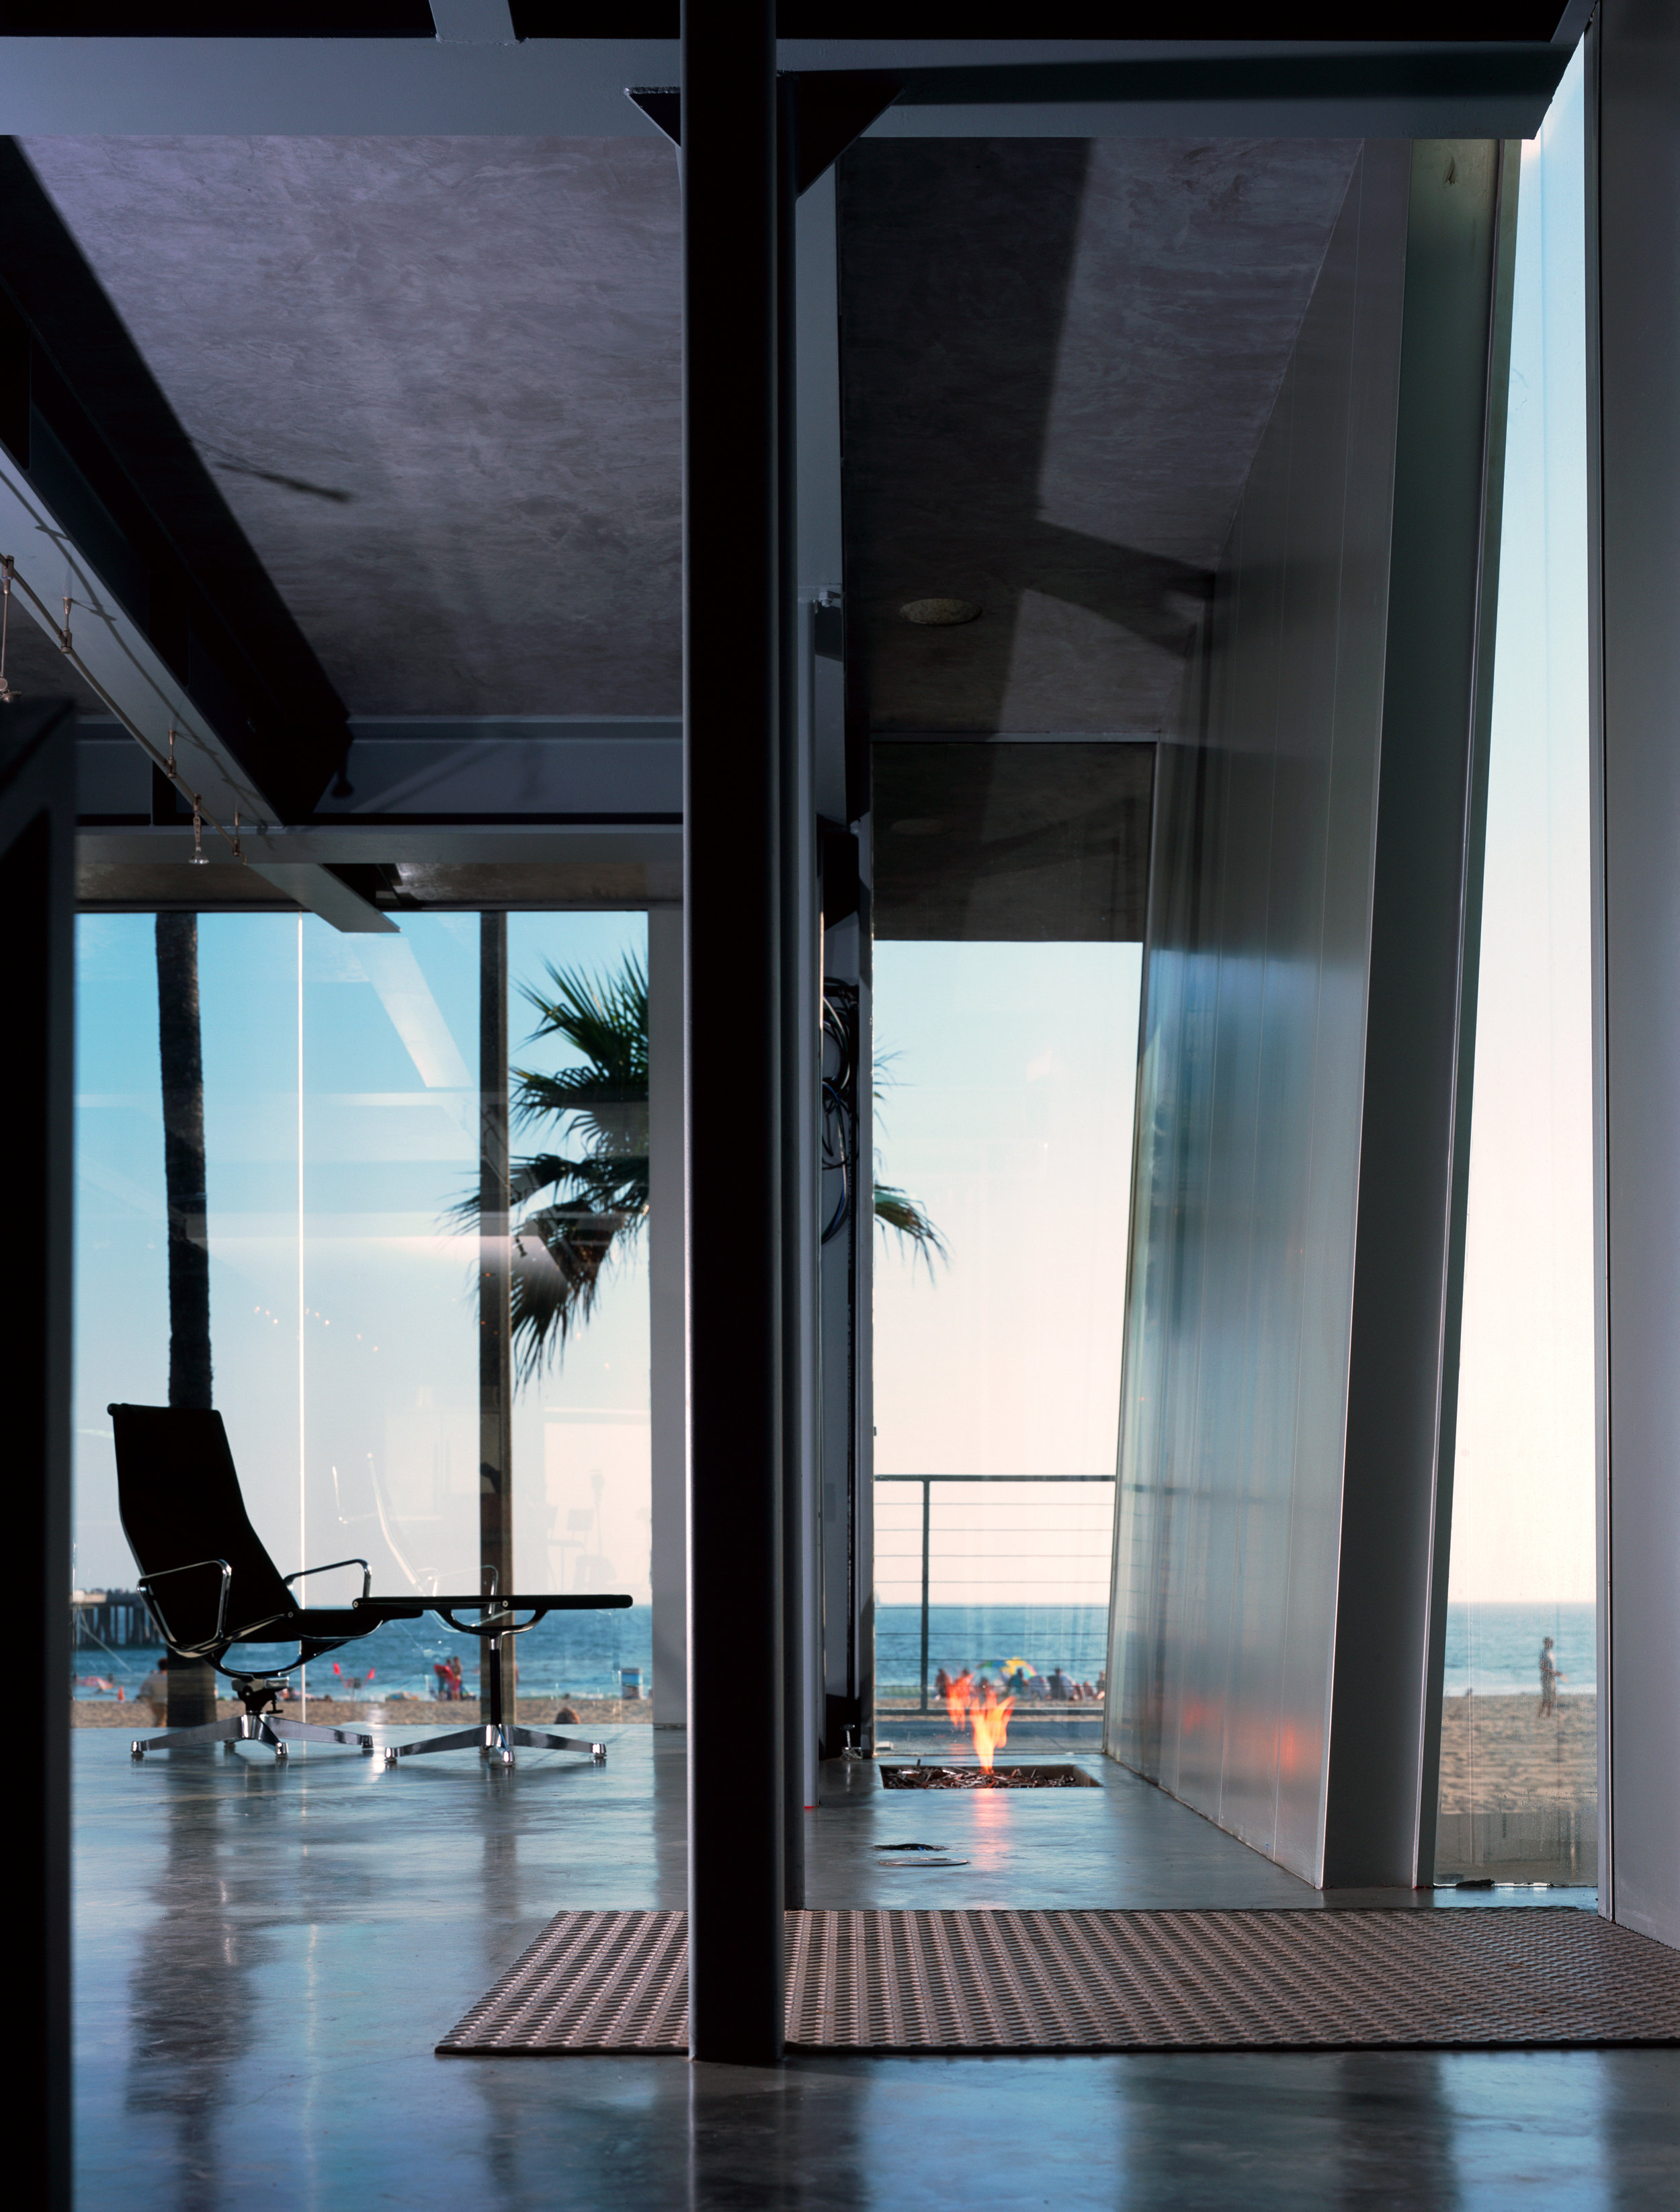 S.E.A.-Studio-Environmental-Architecture-David-Hertz-FAIA-Panel-House-Venice-Beach-California-sustainable-regenerative-restorative-green-design-prefabricated-aluminum-refrigeration-open-concept-ocean-view-residential-glass-steel-sunset-interior-8.jpg